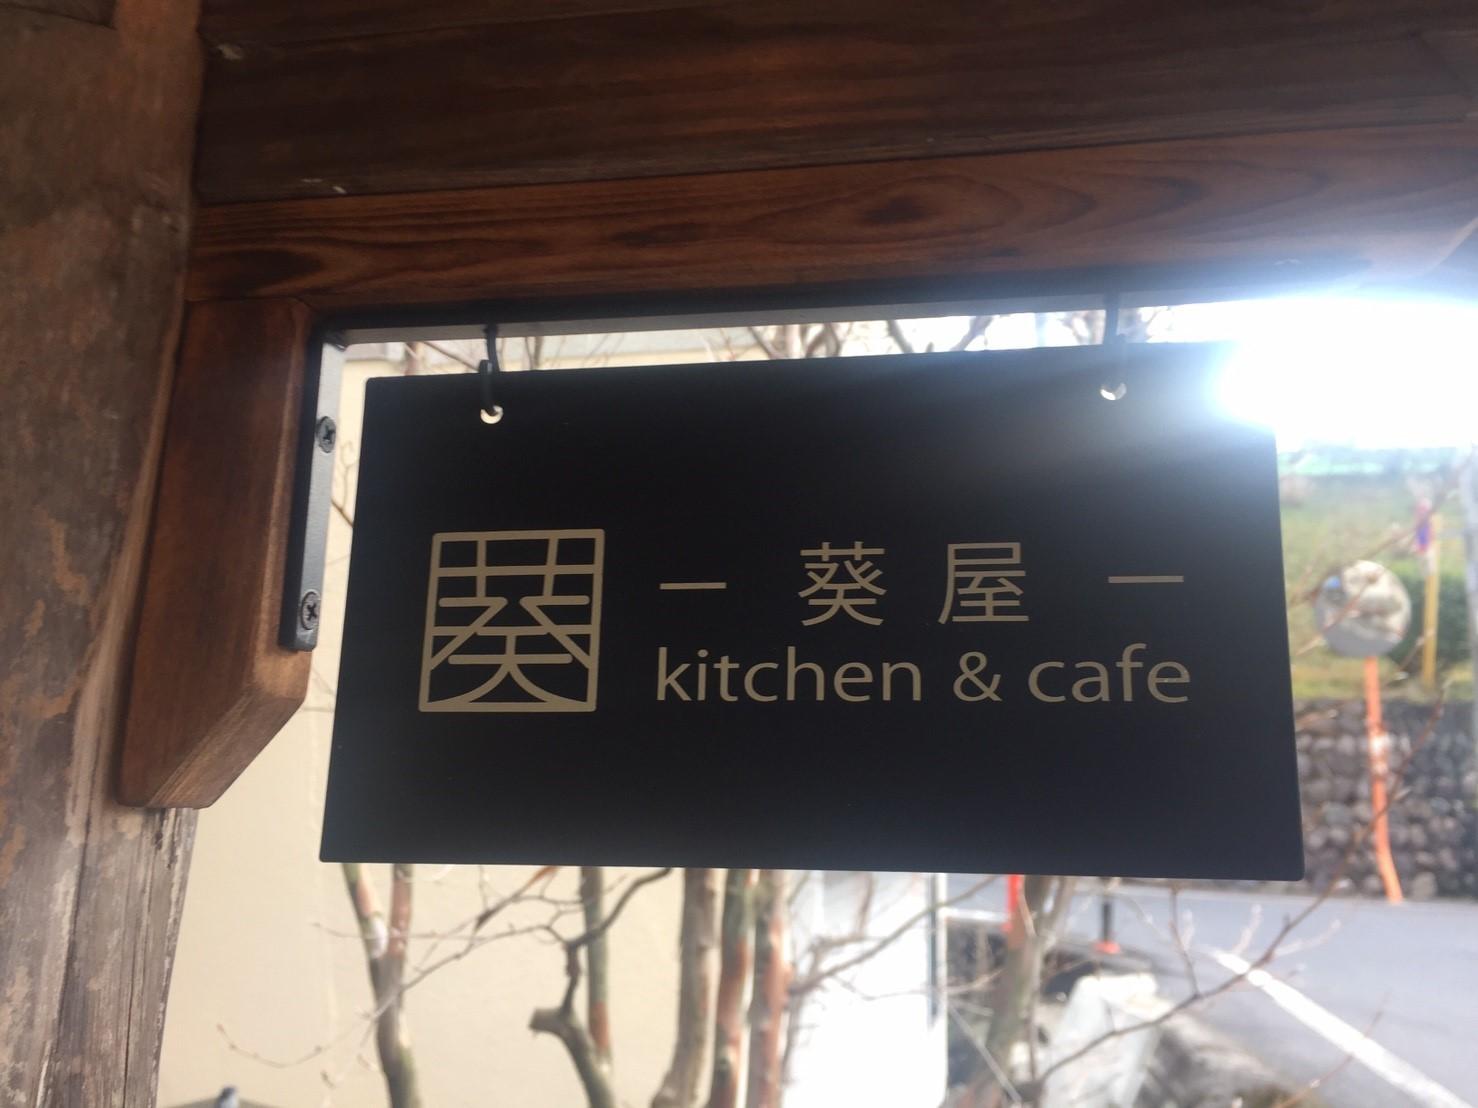 kitchin & cafe 葵屋_e0115904_04132194.jpg